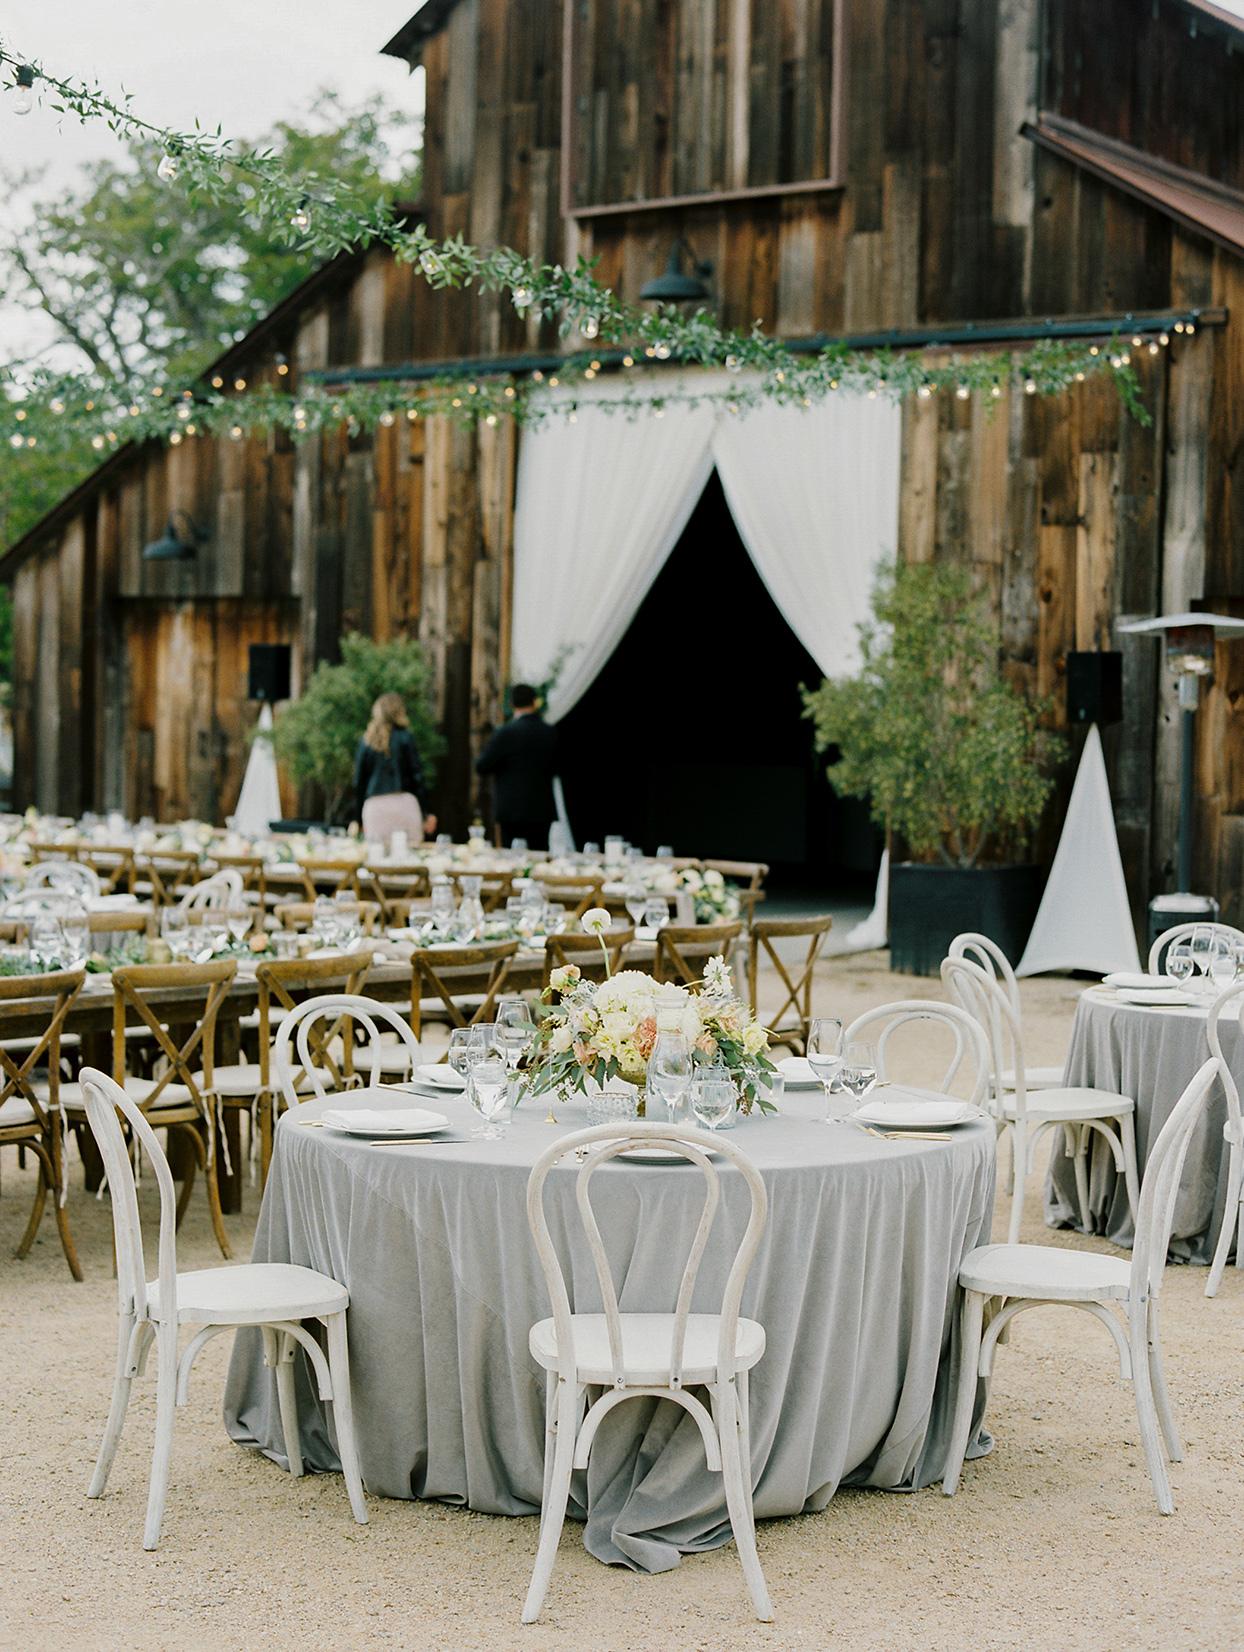 mika steve wedding reception outside rustic barn